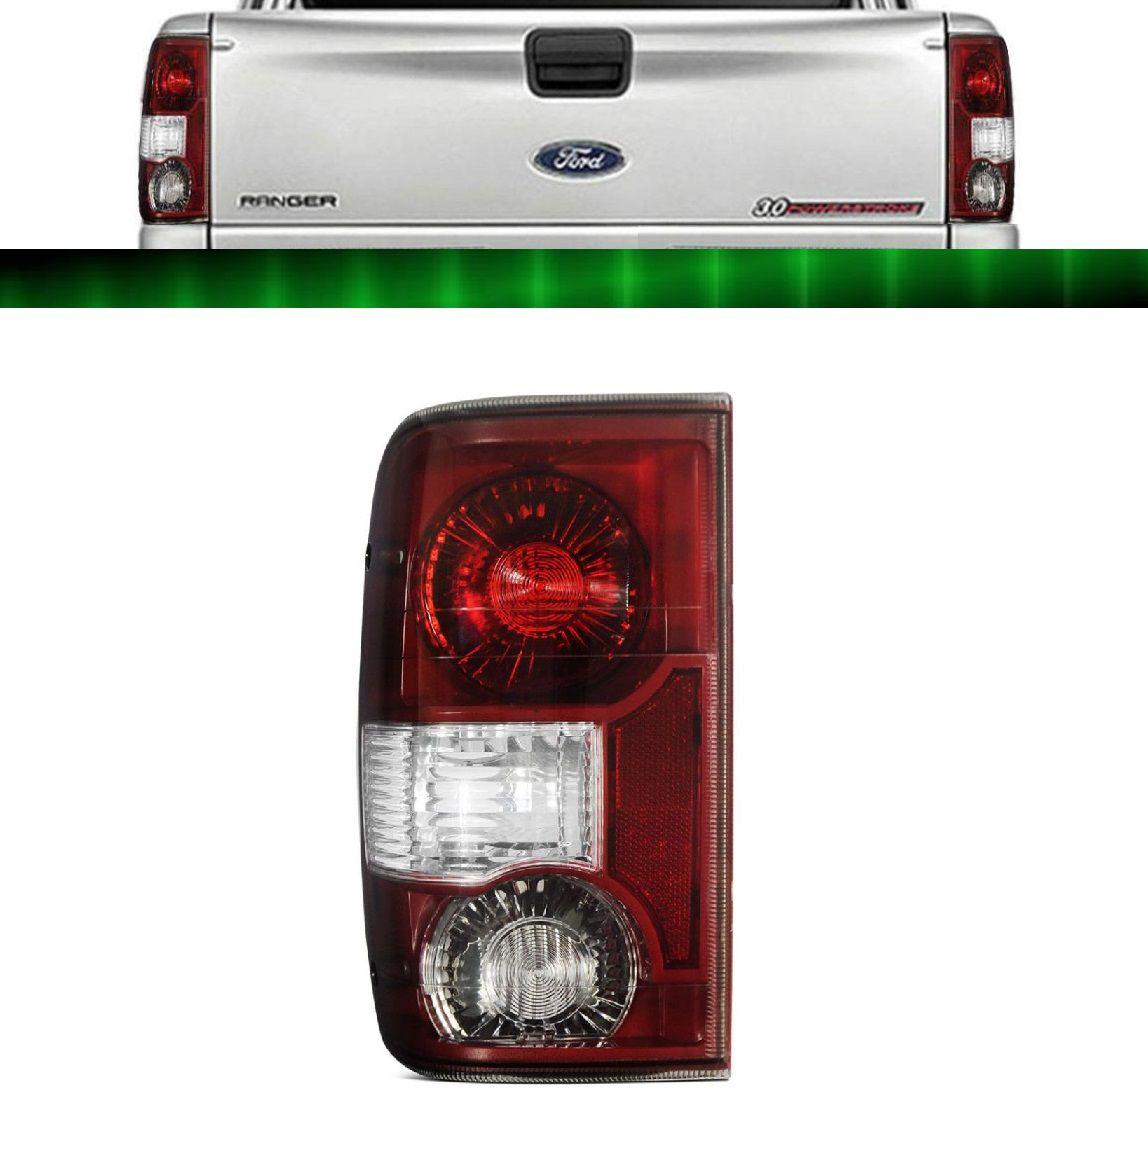 Lanterna Traseira Ford Ranger 2004 2005 2006 2007 2008 2009